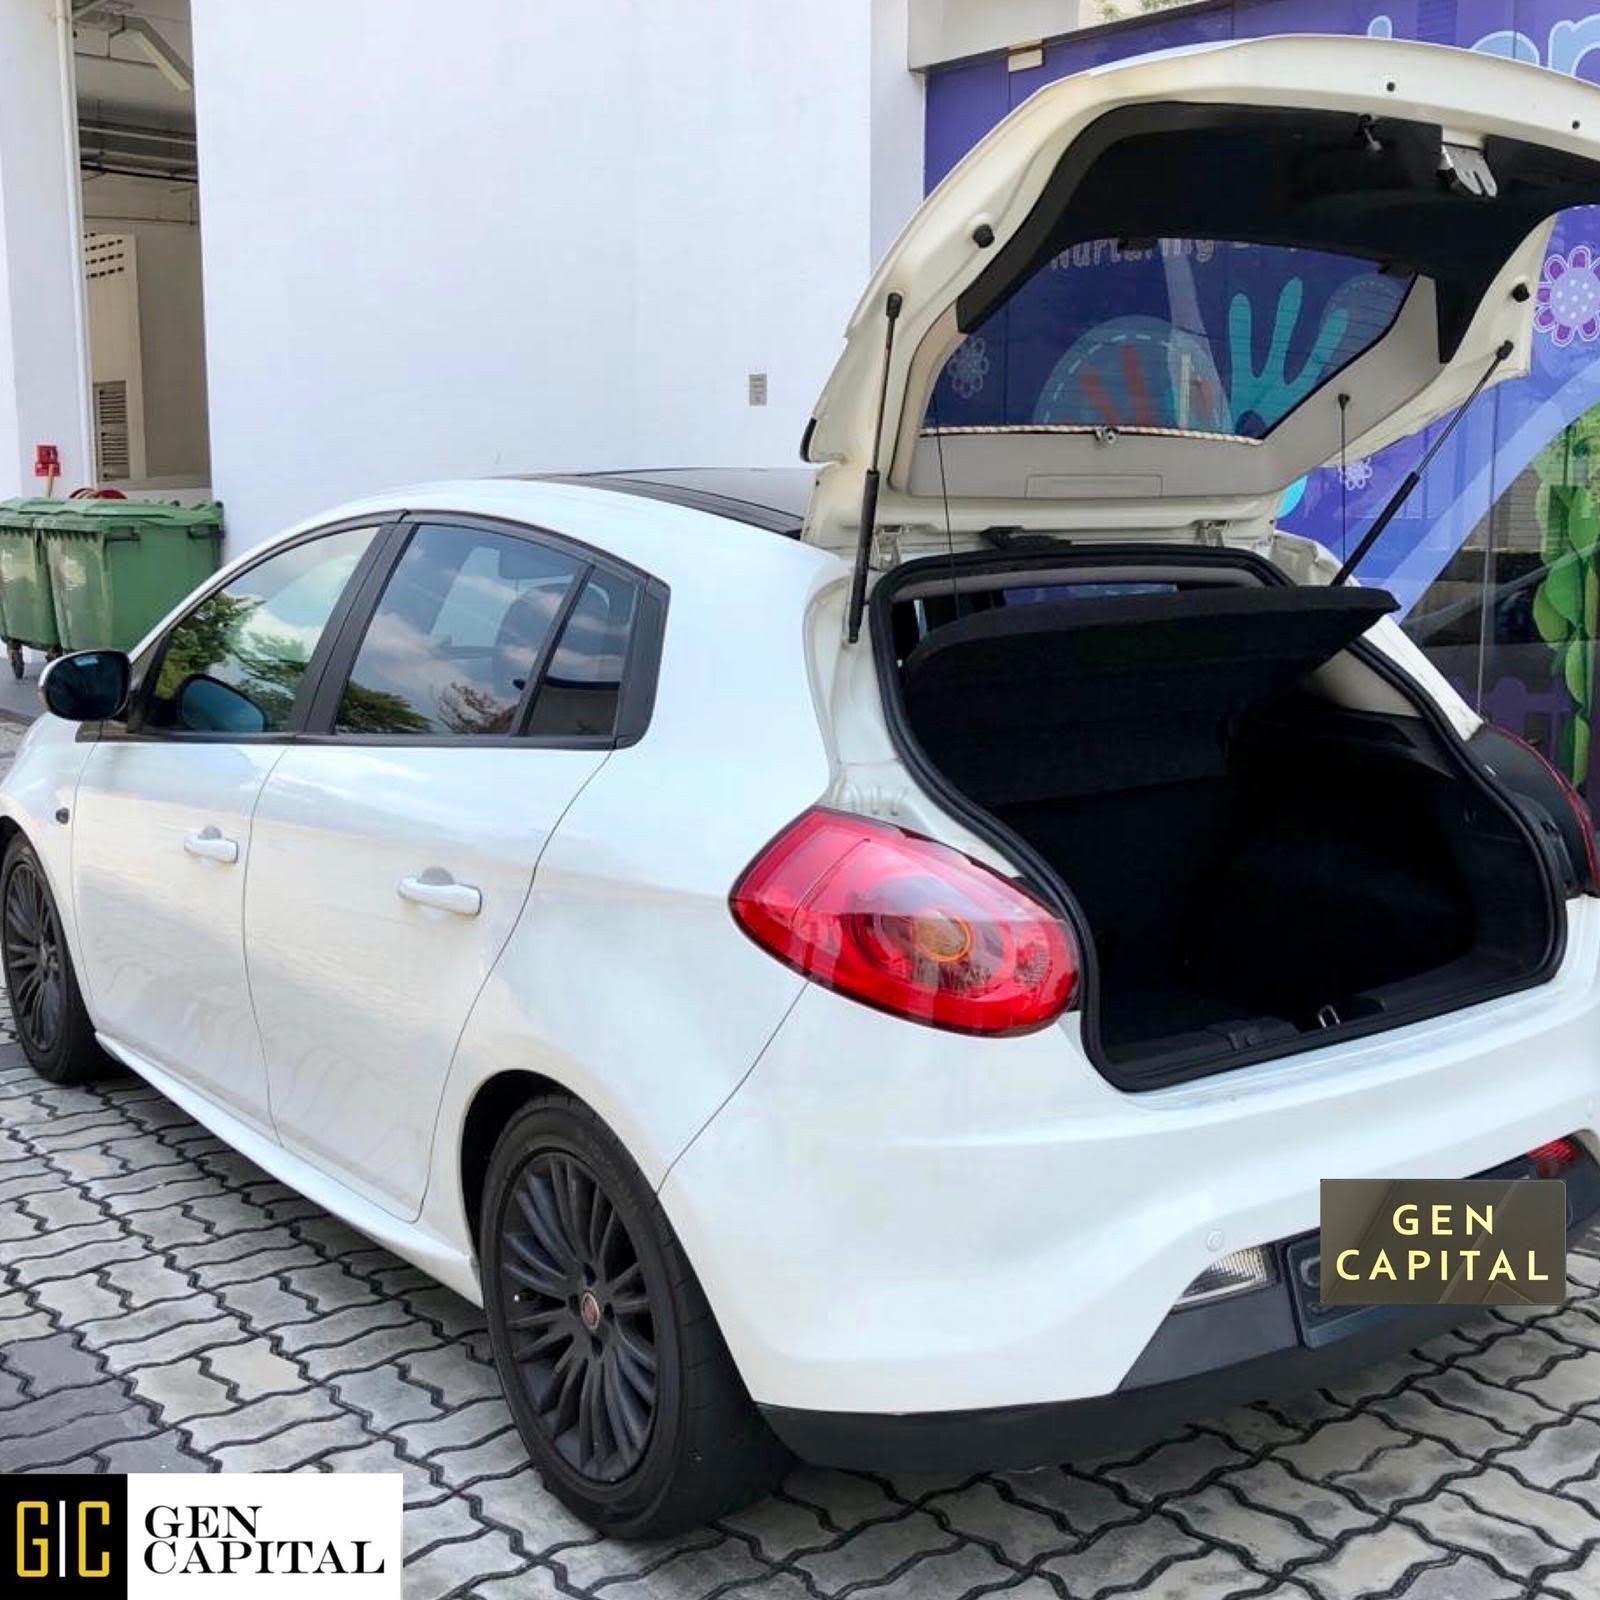 Fiat BRAVO 1.4 TURBO Short Term or Long Term Rental Car Service